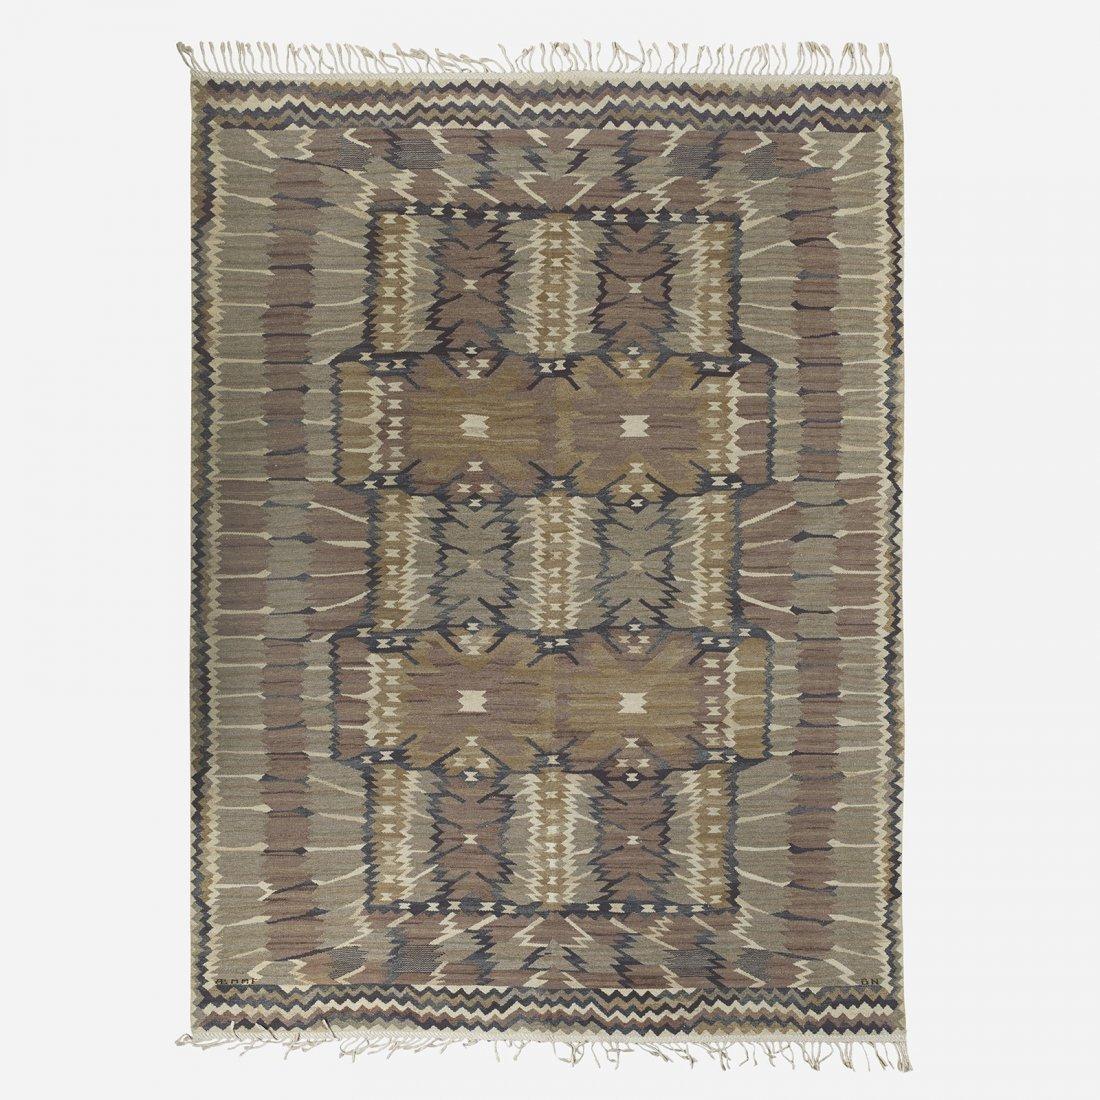 Barbro Nilsson Strålblomman flatweave carpet